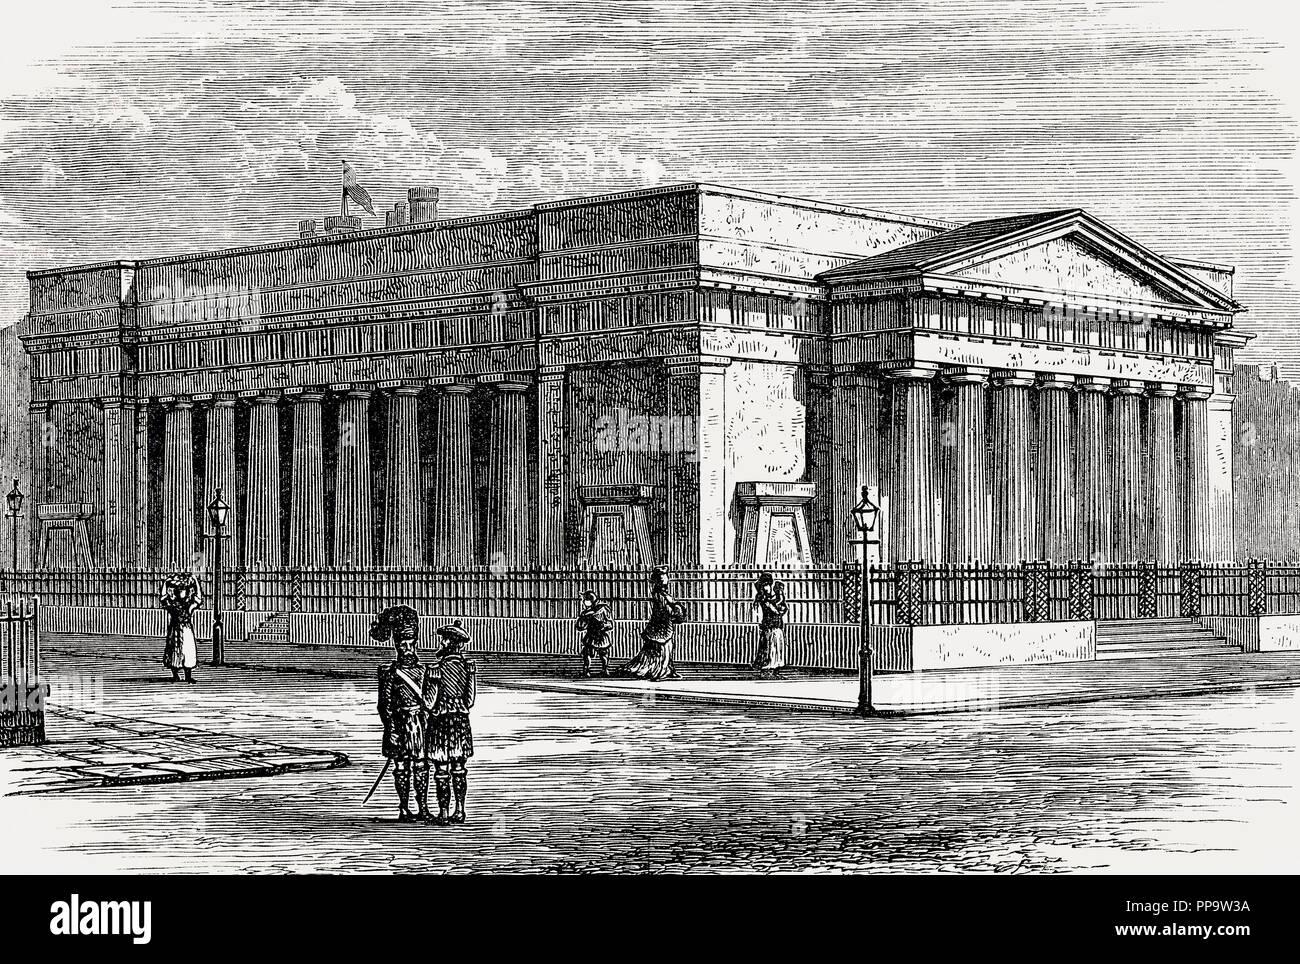 Royal Institution or Royal Scottish Academy, Edinburgh, Scotland, 19th century - Stock Image